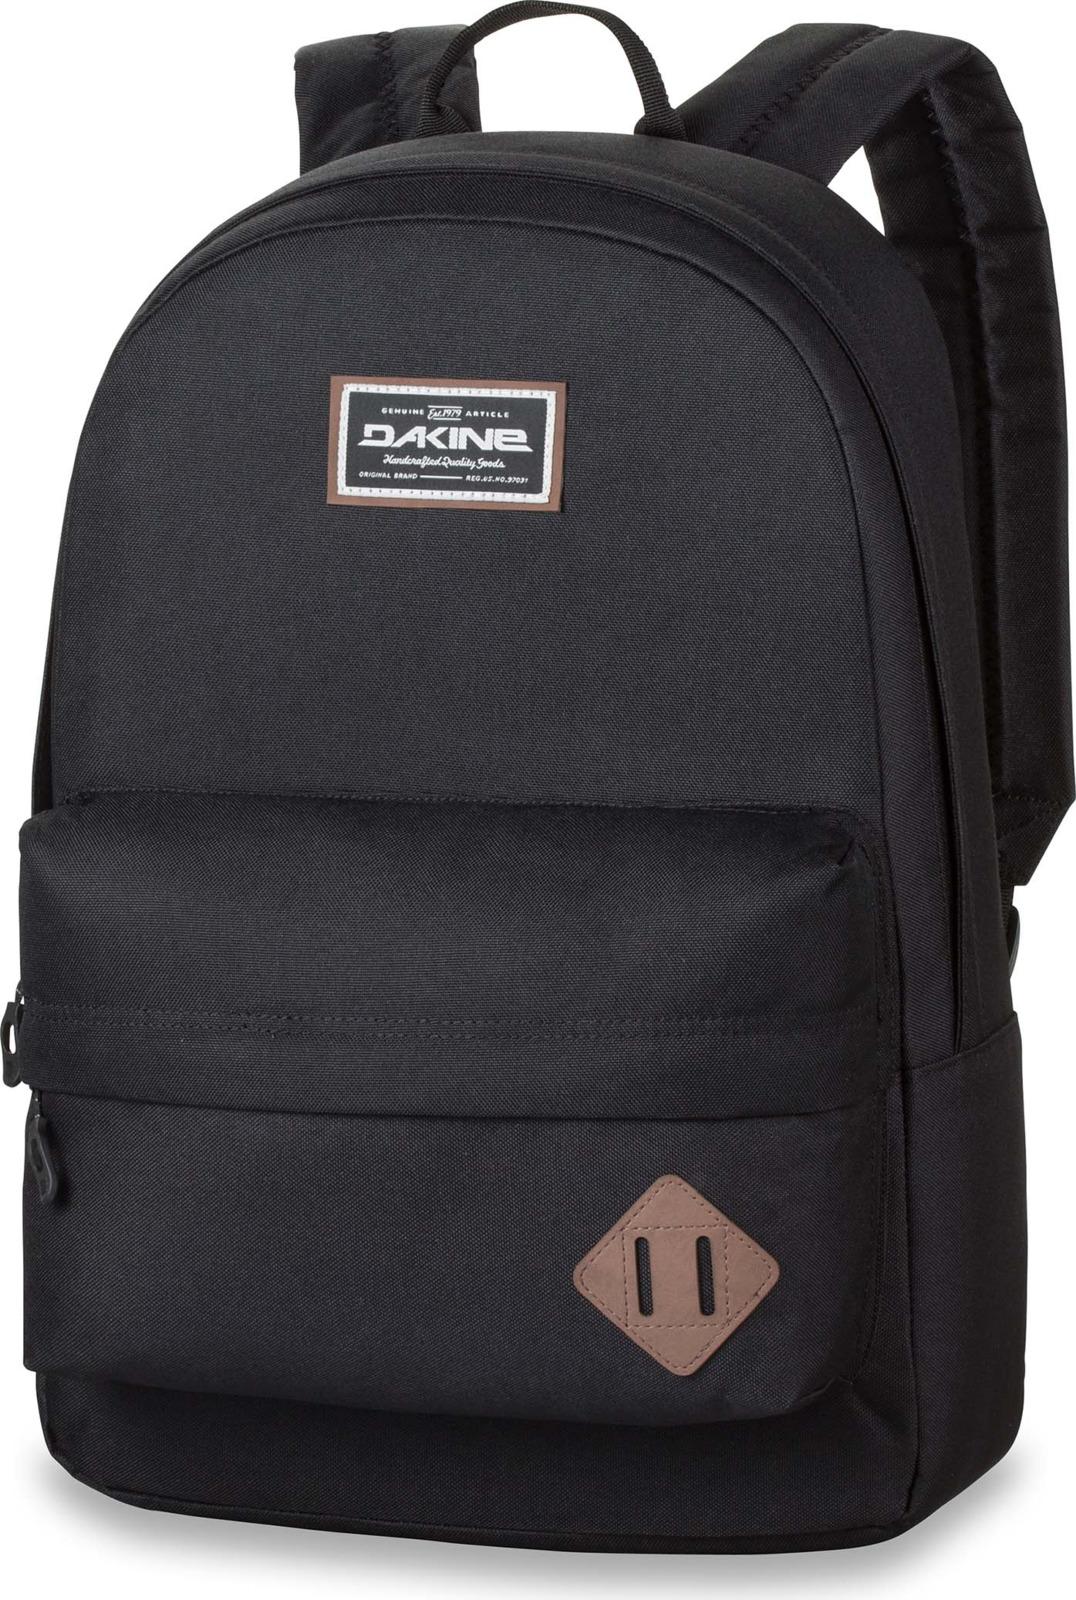 Рюкзак Dakine 365 Pack, цвет: черный, 21 л цена